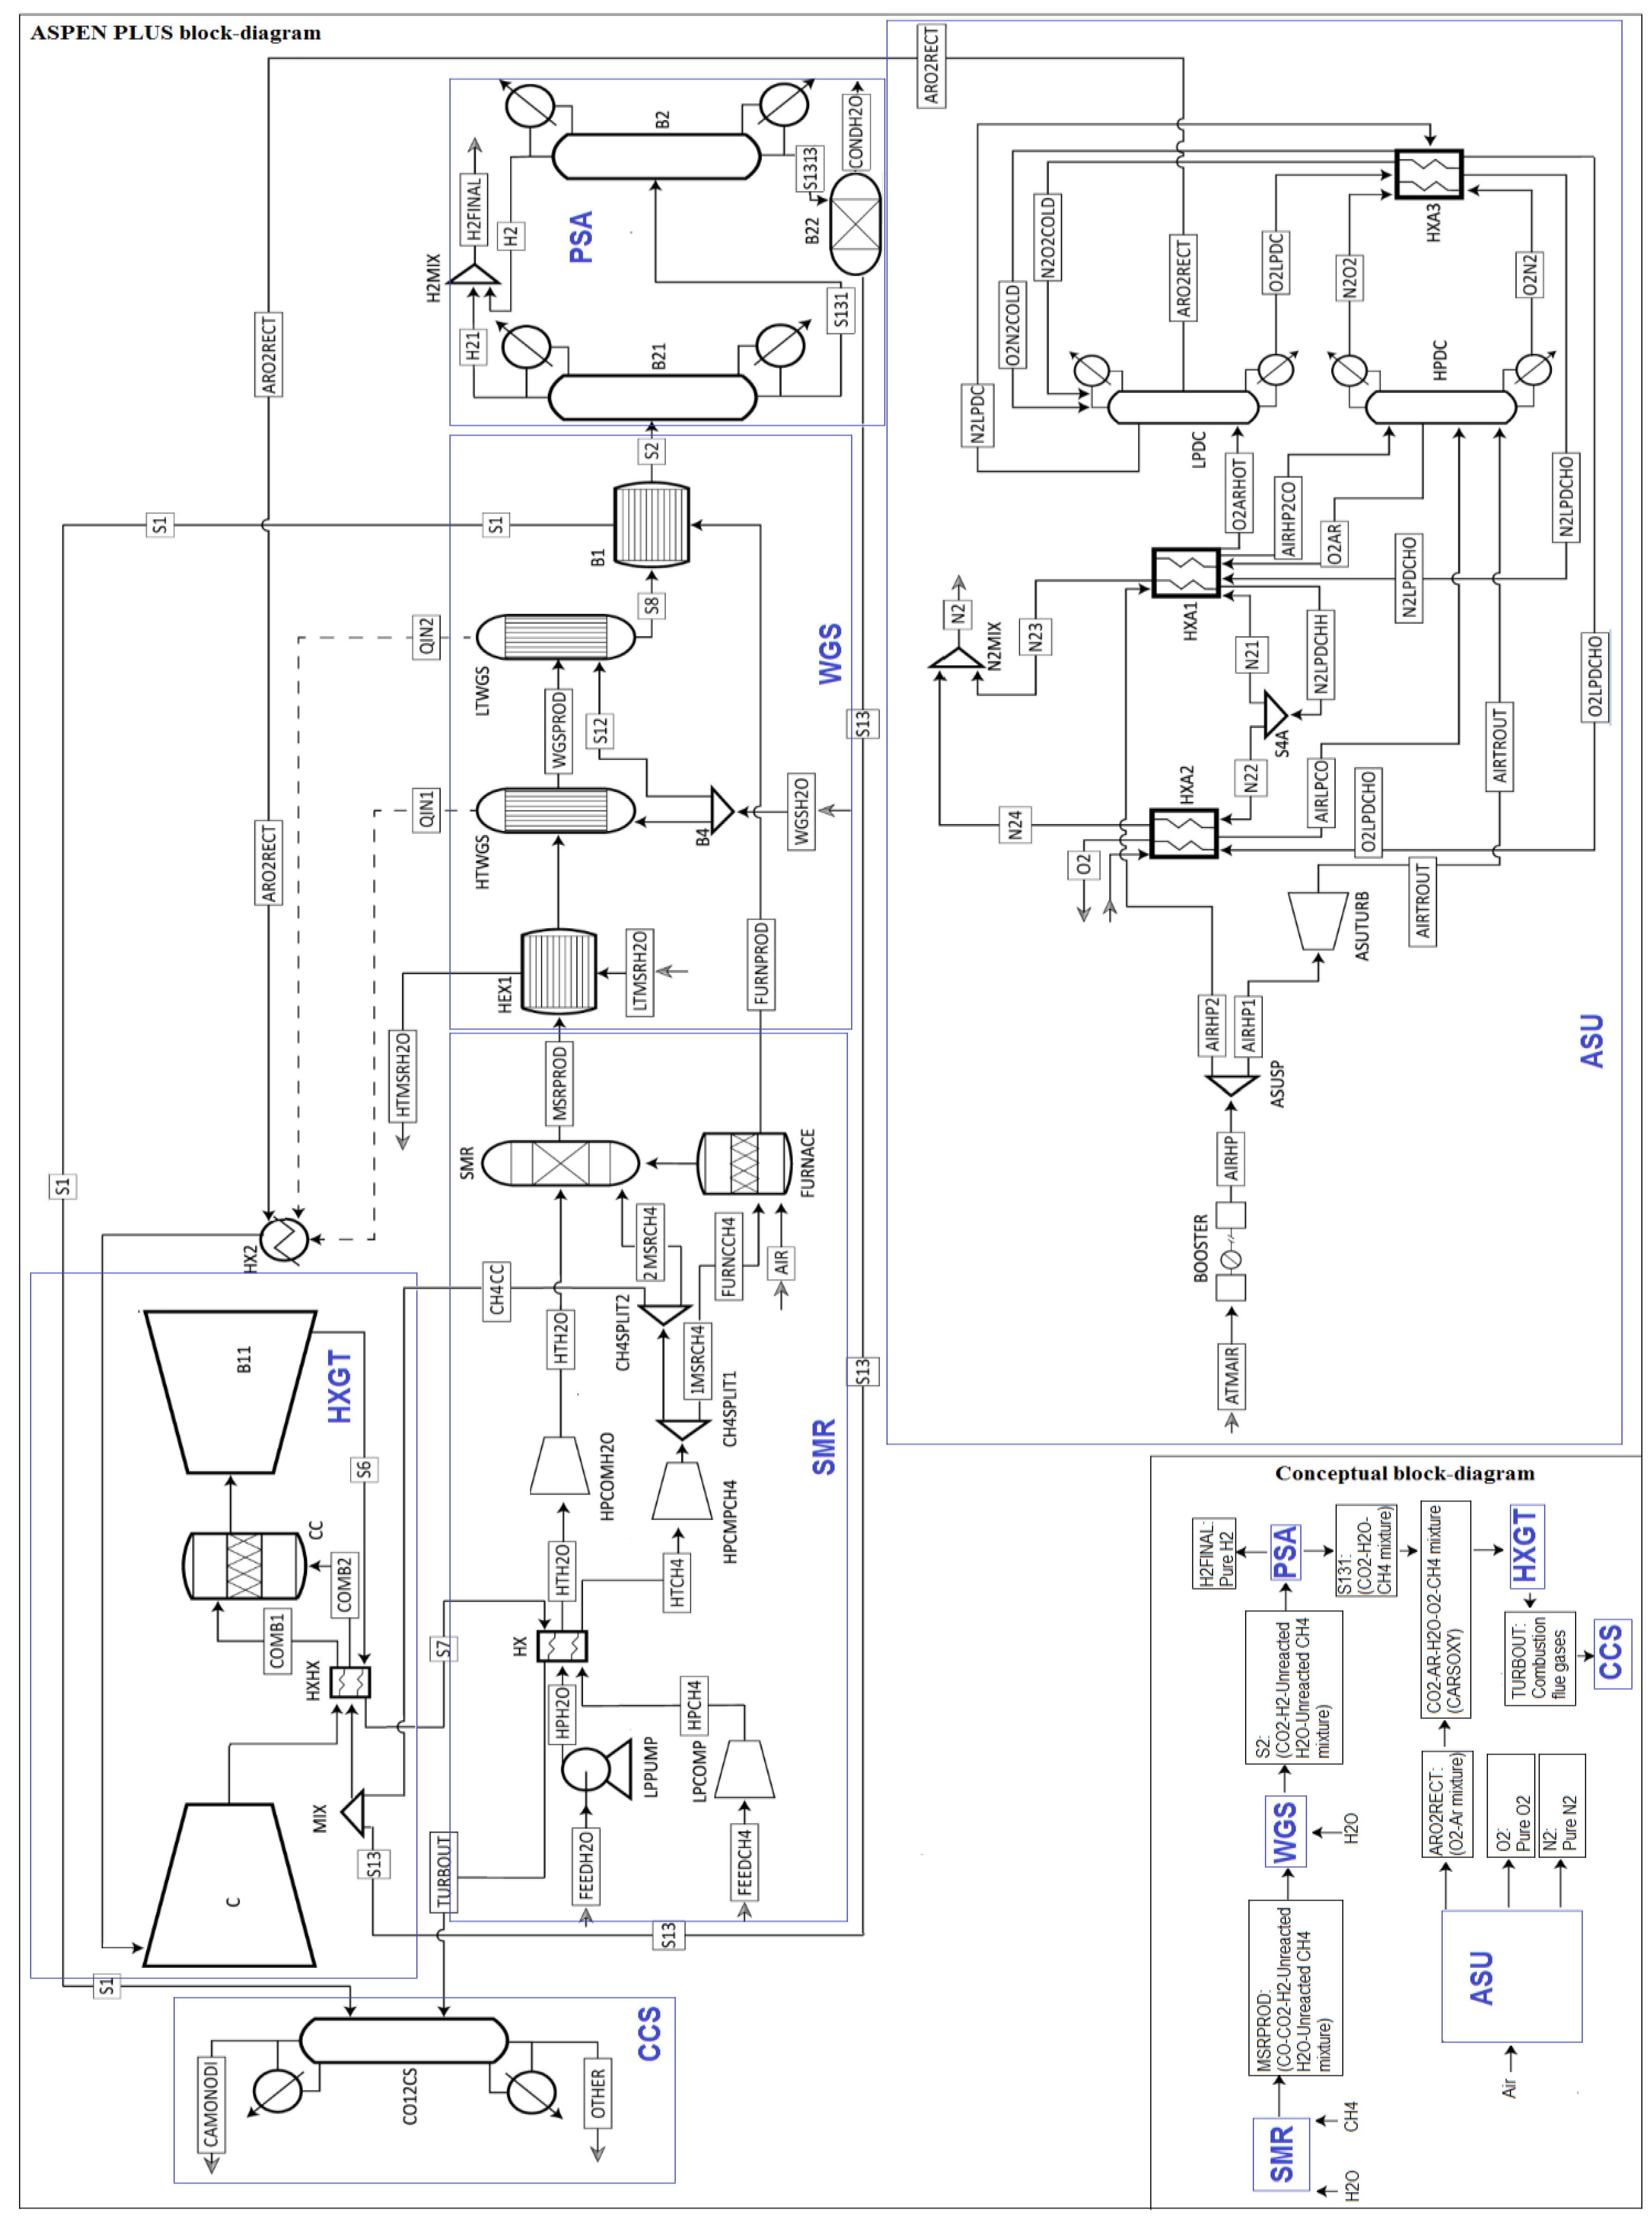 Generator Wiring Diagram Moreover On 650r Receptacle Wiring Diagram